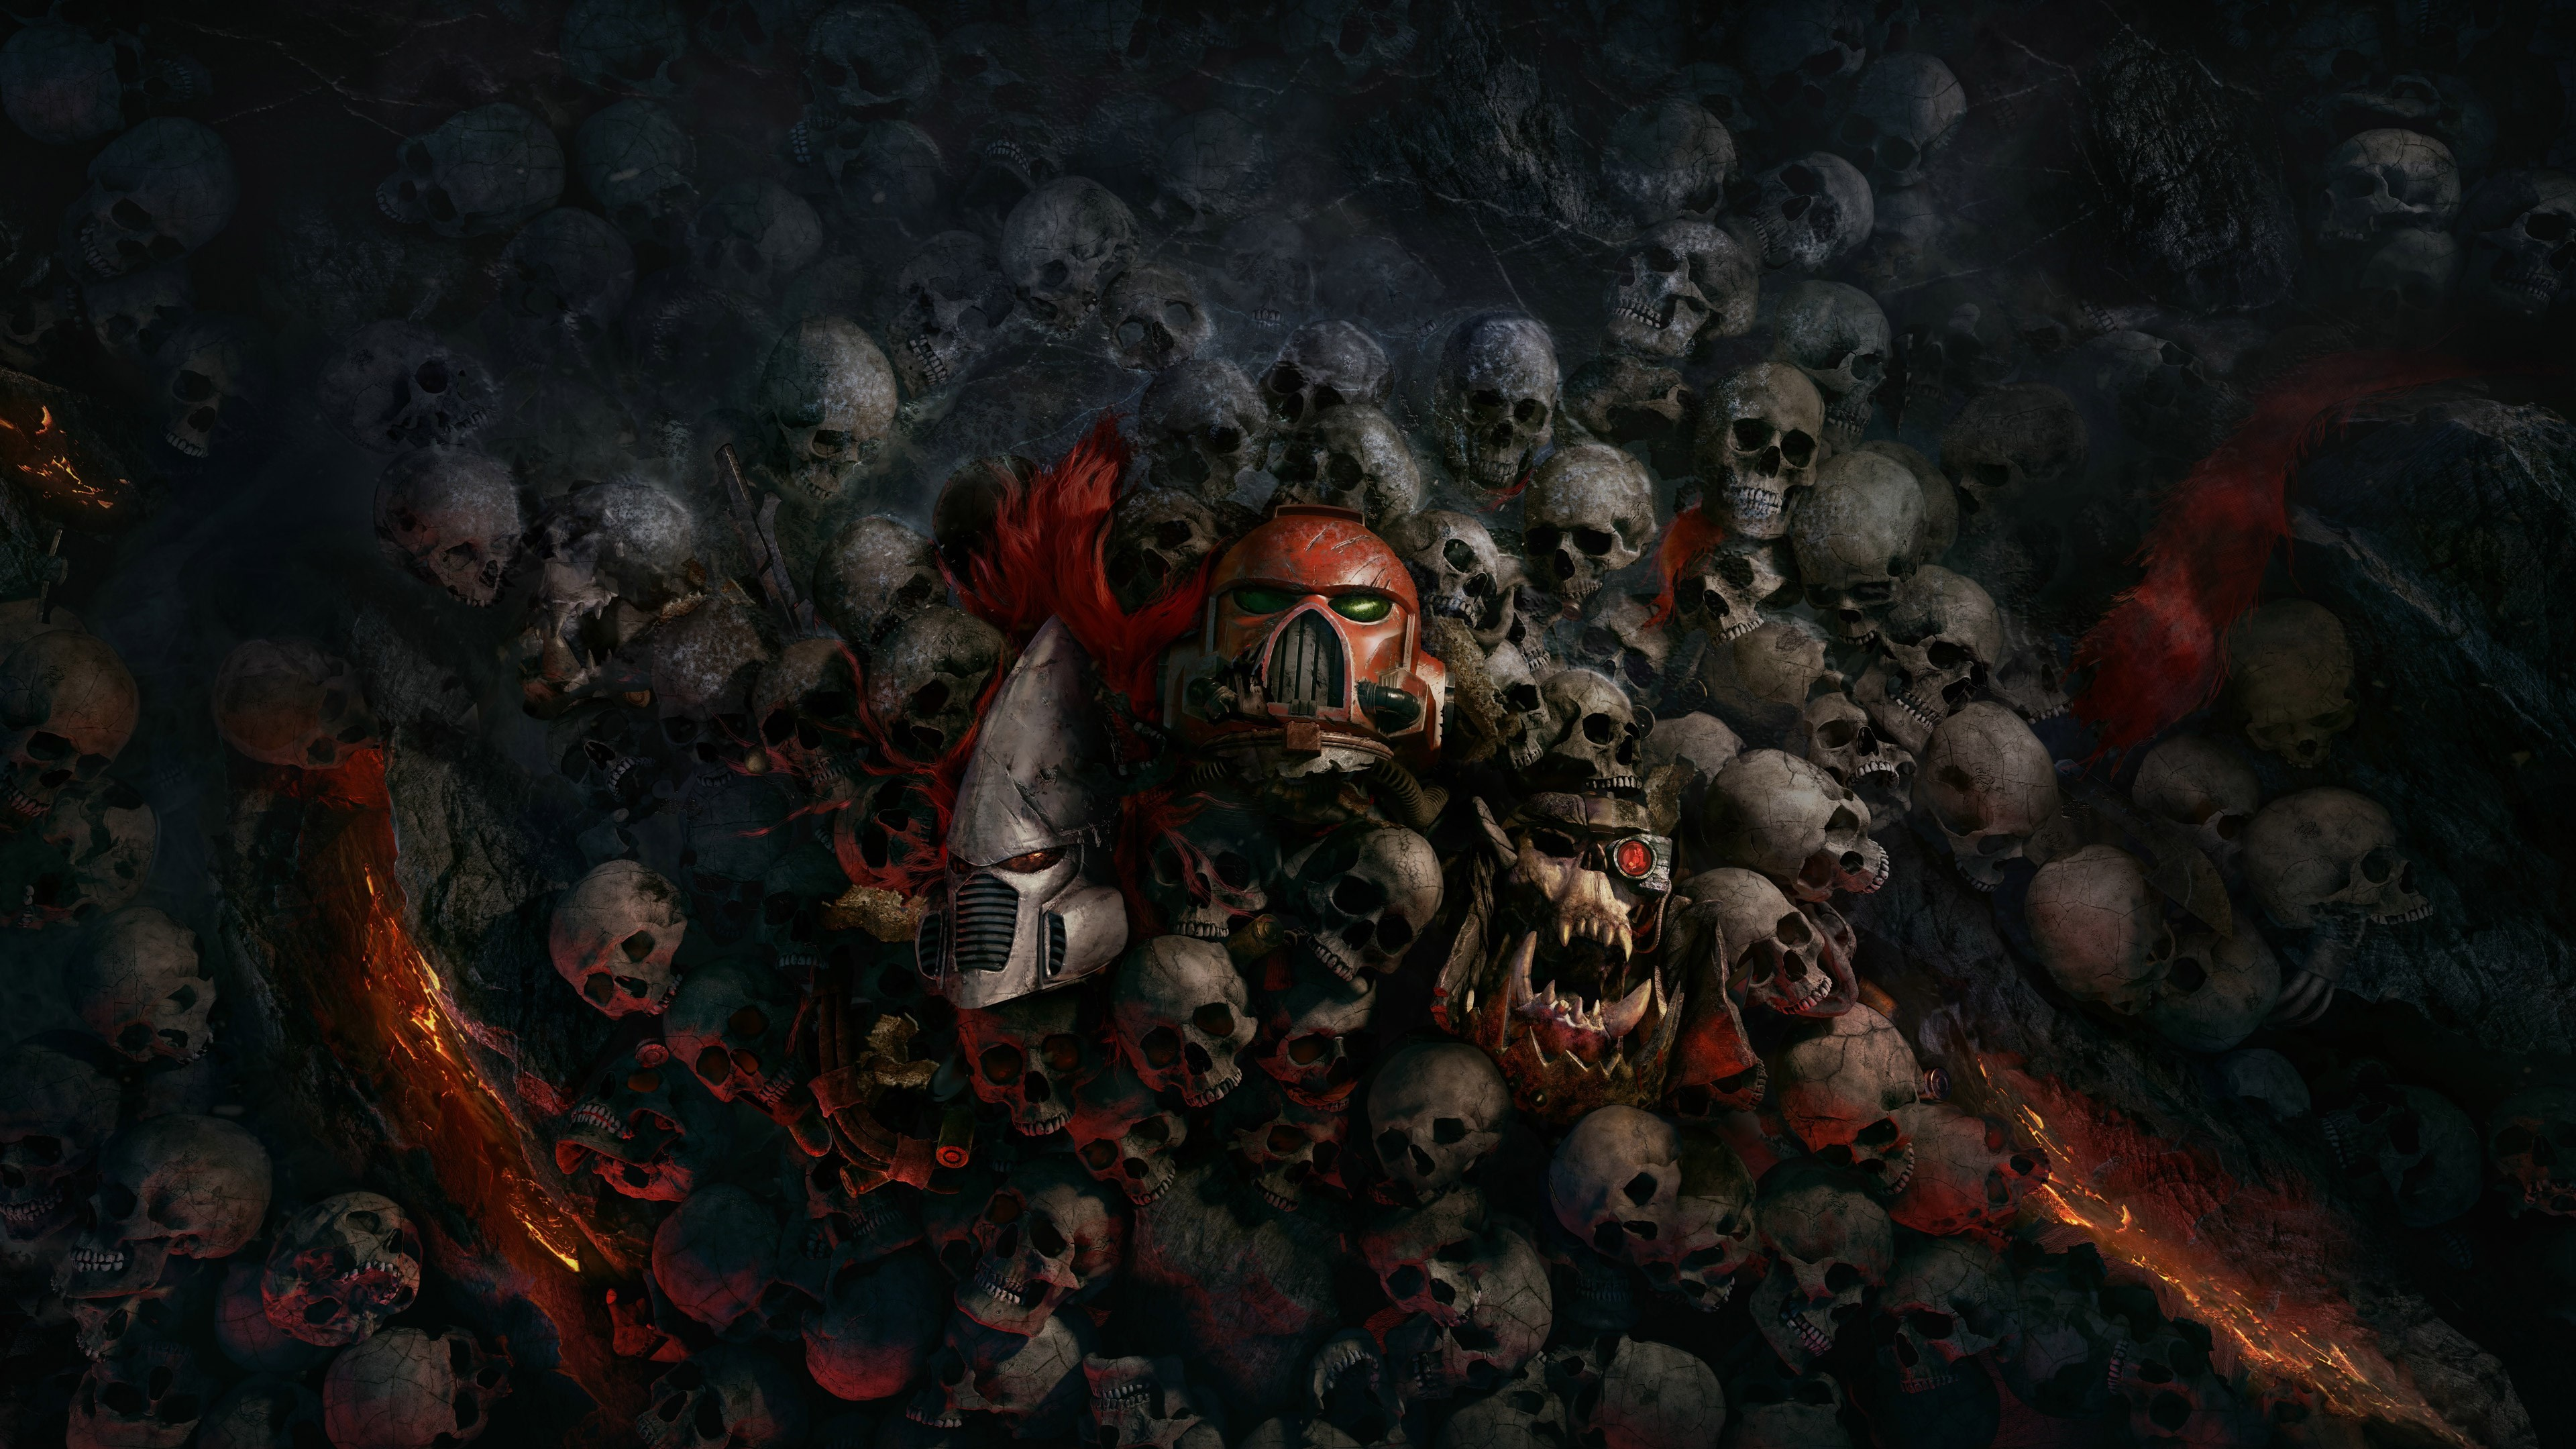 Warhammer Dawn of War III wallpaper: Wallpapers Collection, kB)